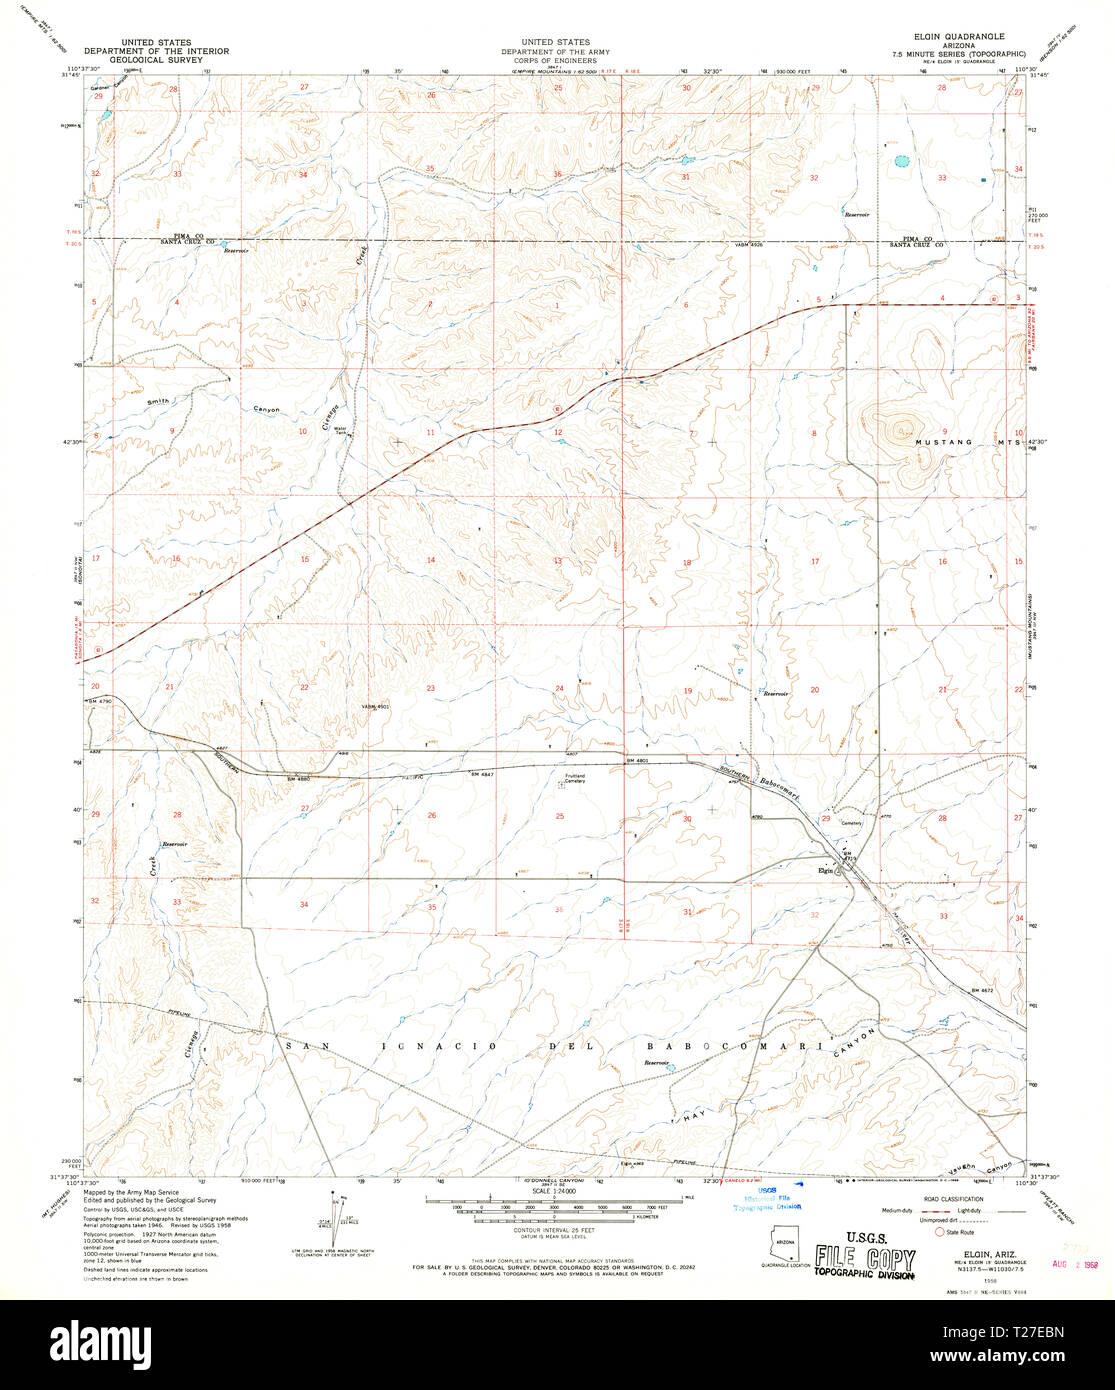 Map Of Elgin Arizona.Elgin Arizona Stock Photos Elgin Arizona Stock Images Alamy